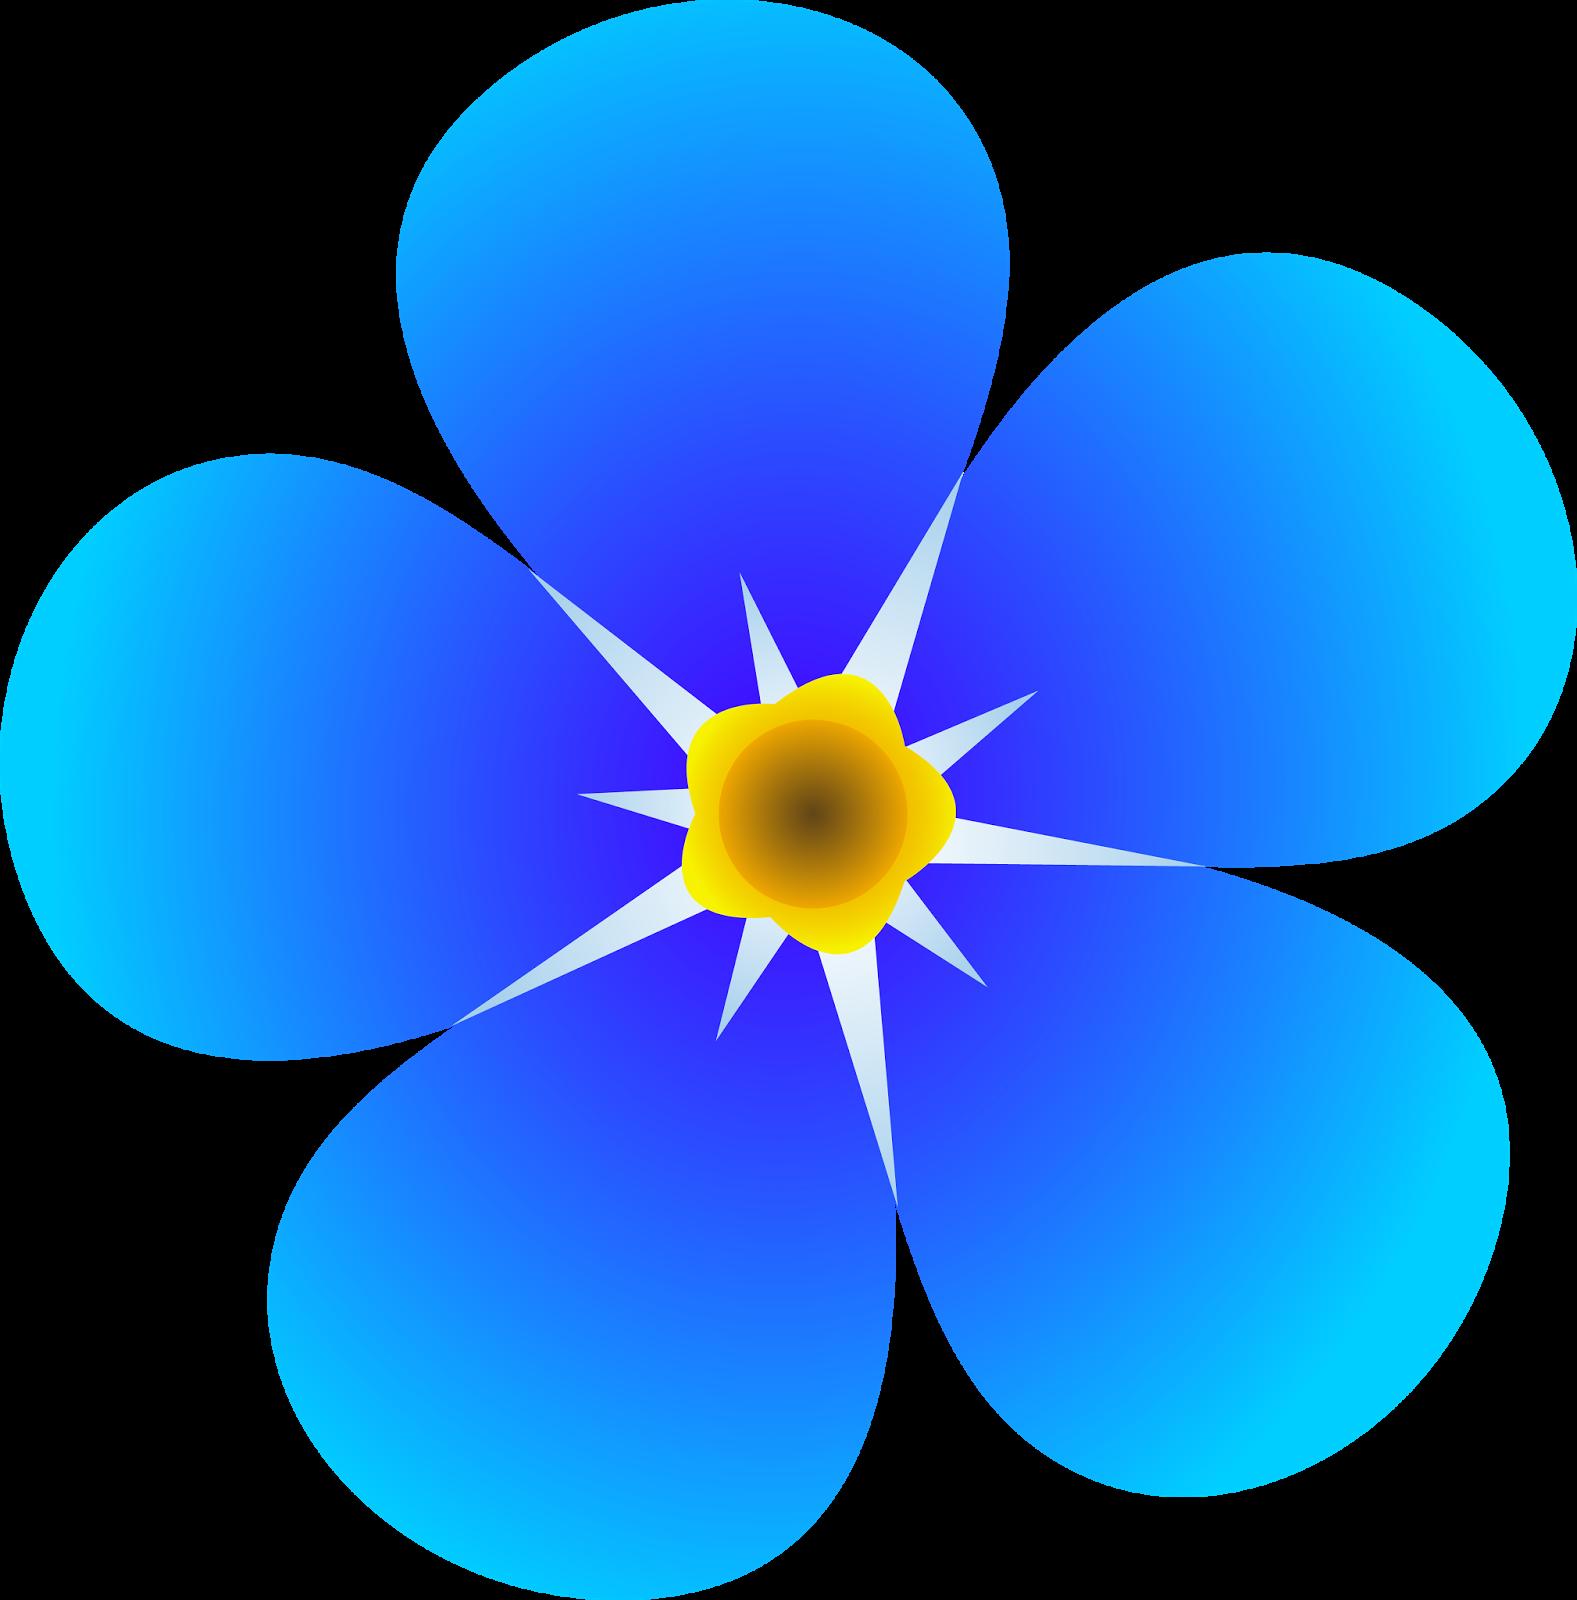 Spring Flower Pot Clipart - Clipart Kid